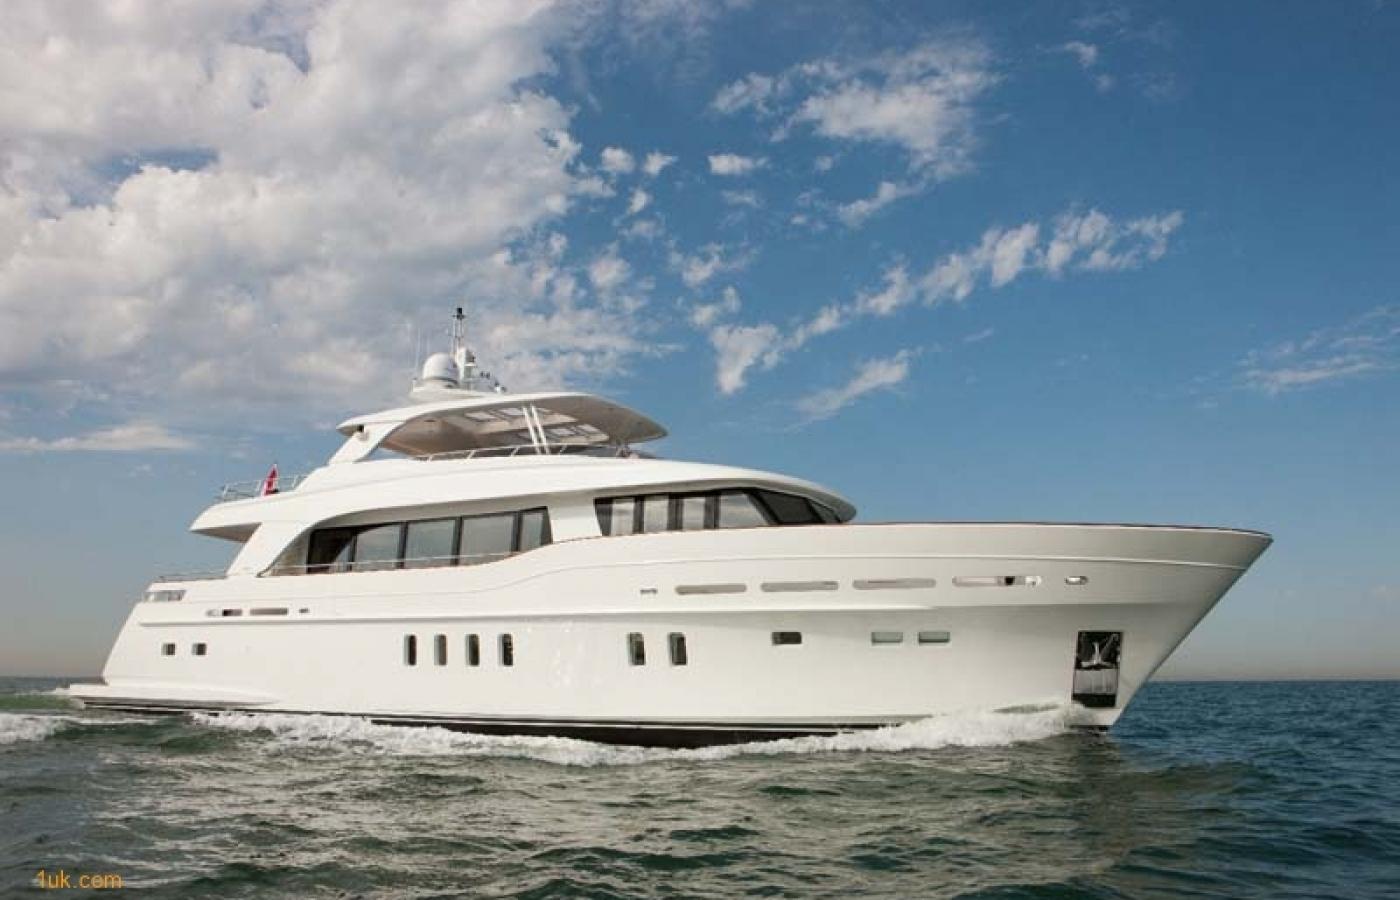 Yacht Firefly - Sea 1